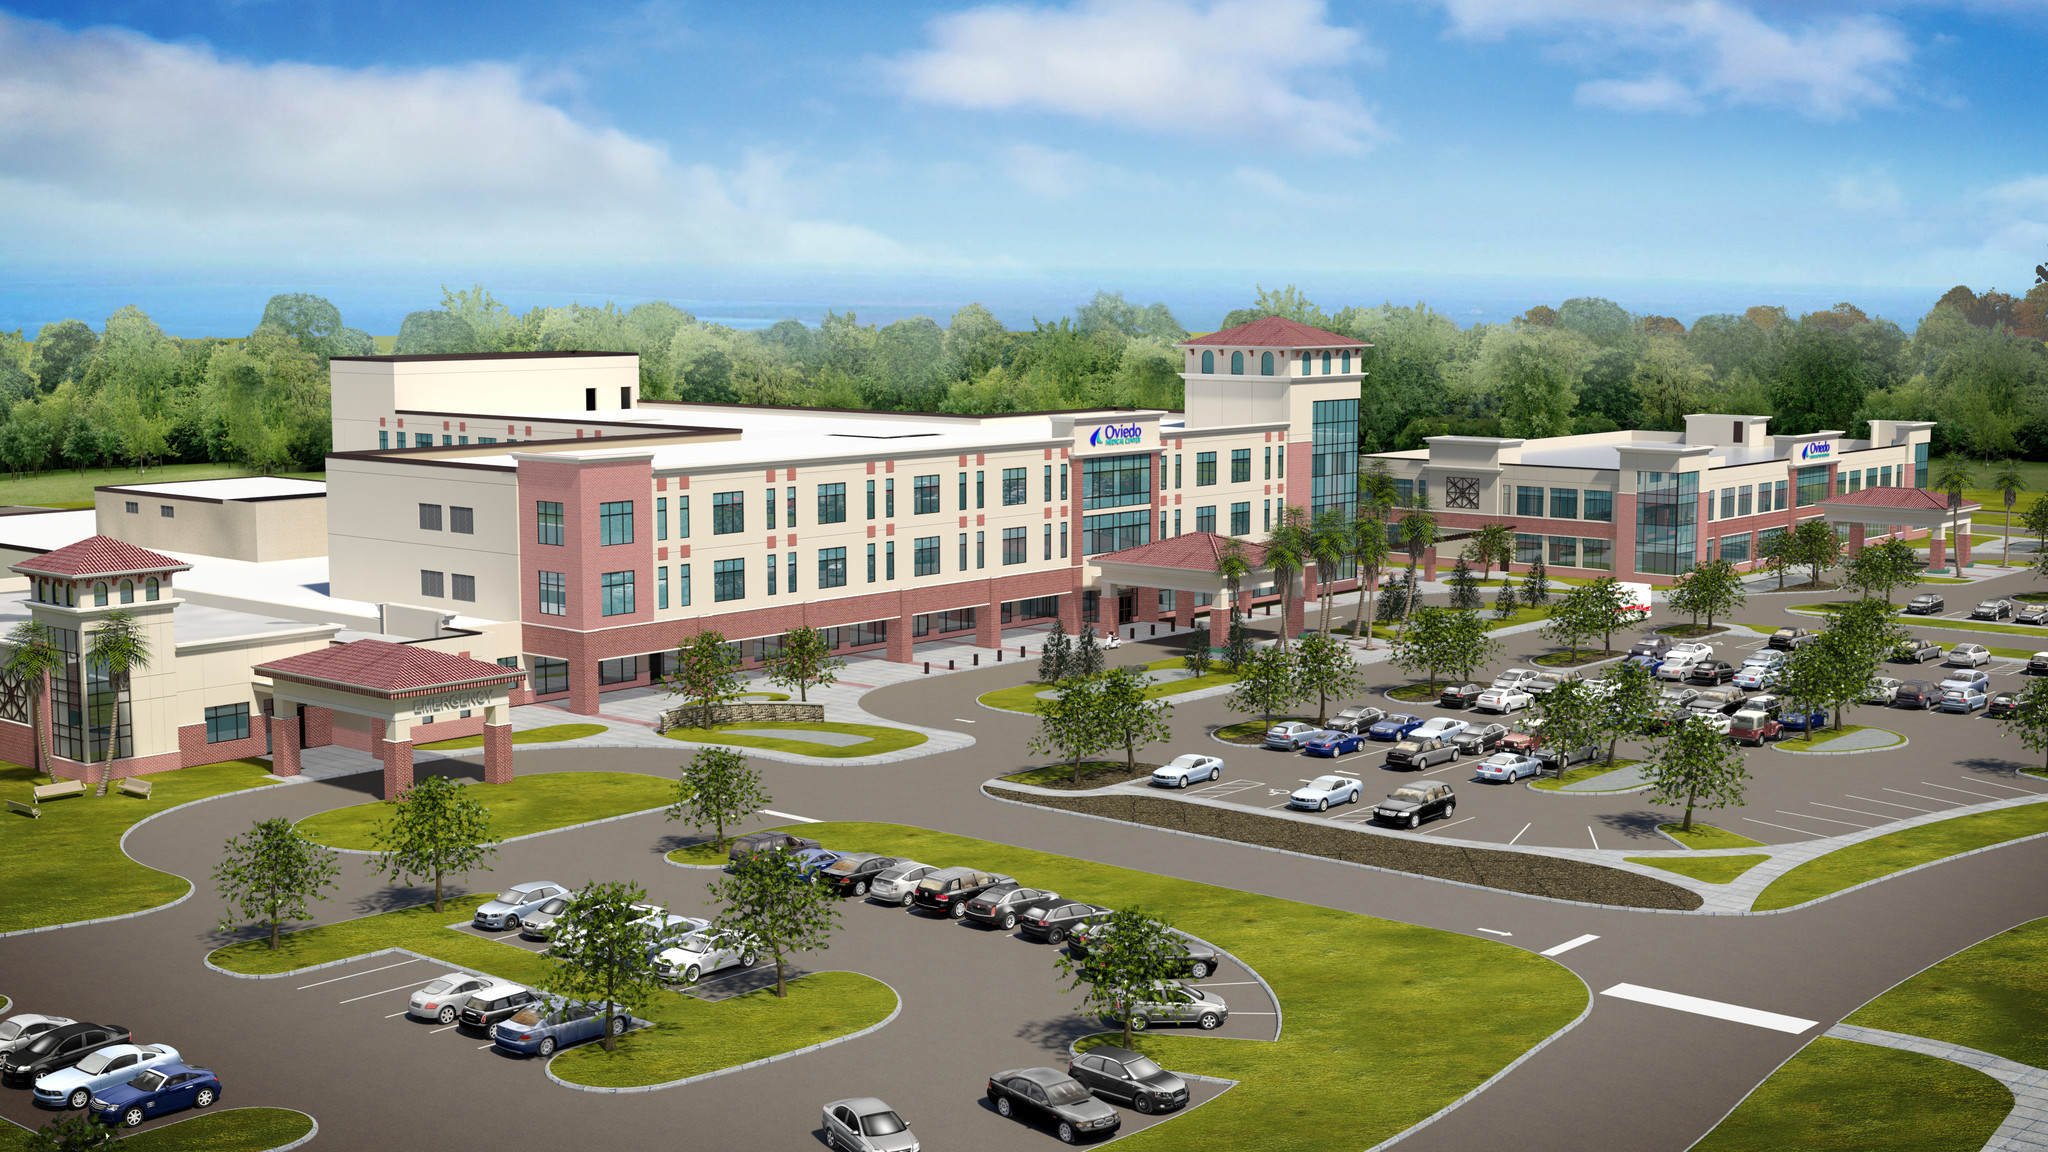 New hospital breaks ground in Oviedo Orlando Sentinel